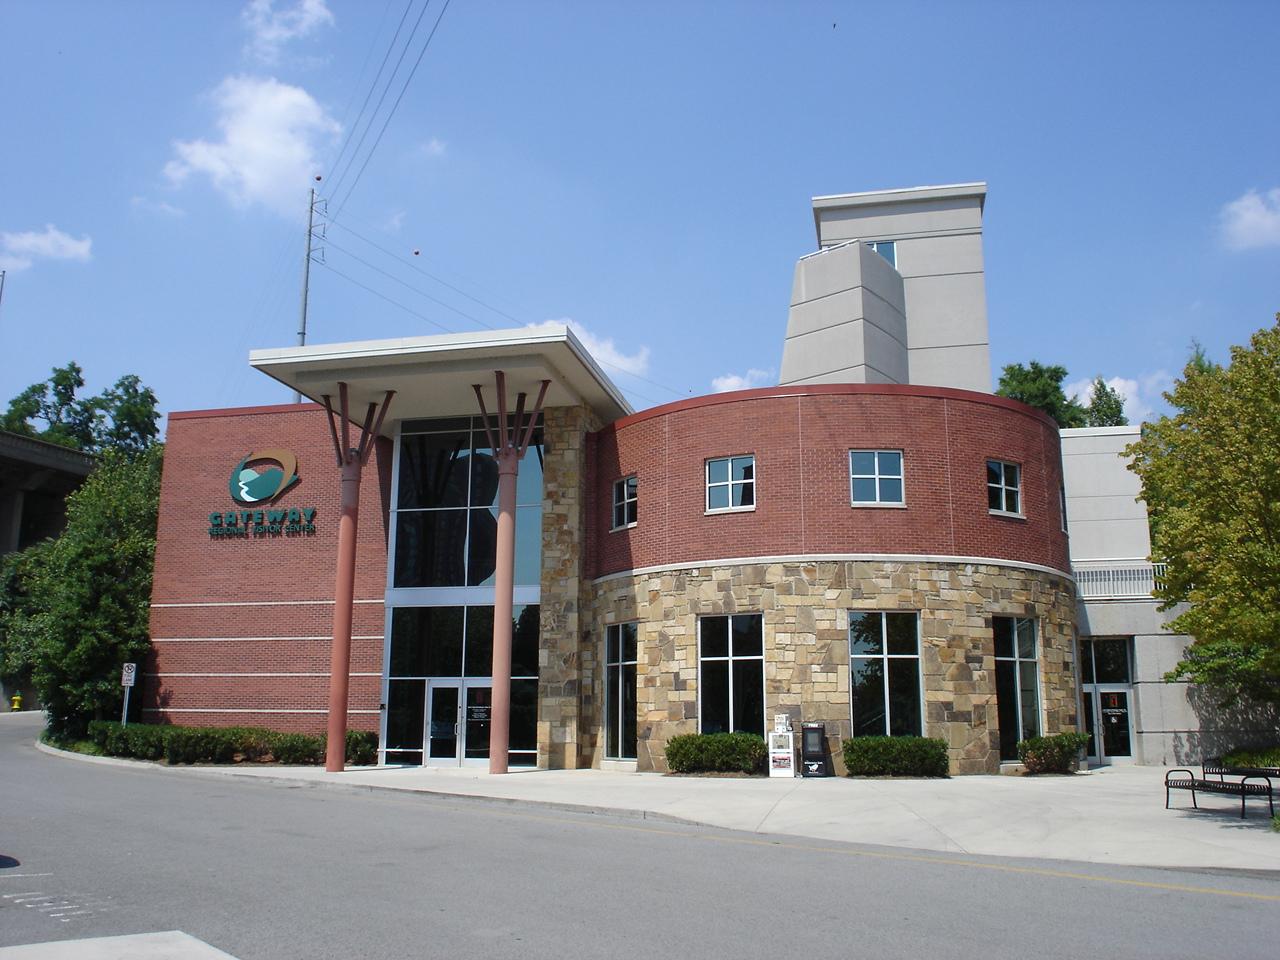 Gateway Visitor Center